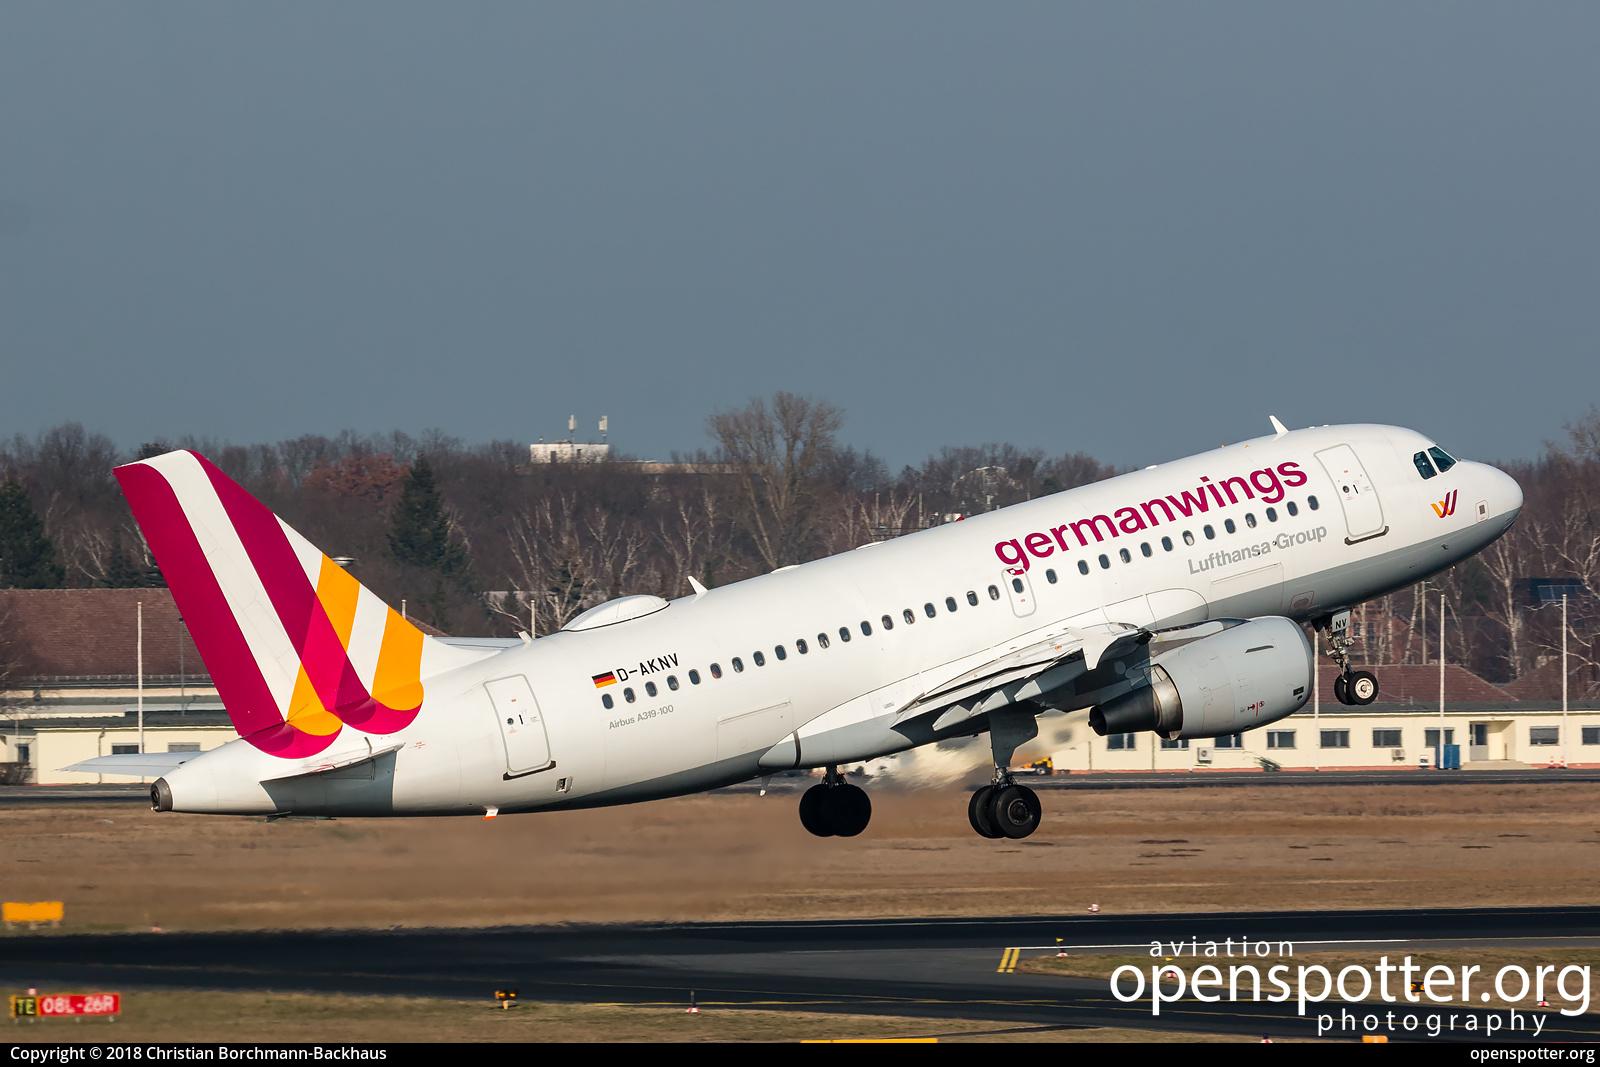 D-AKNV - Germanwings Airbus A319-112 at Berlin-Tegel Airport (TXL/EDDT) taken by Christian Borchmann-Backhaus | openspotter.org | ID: 51520